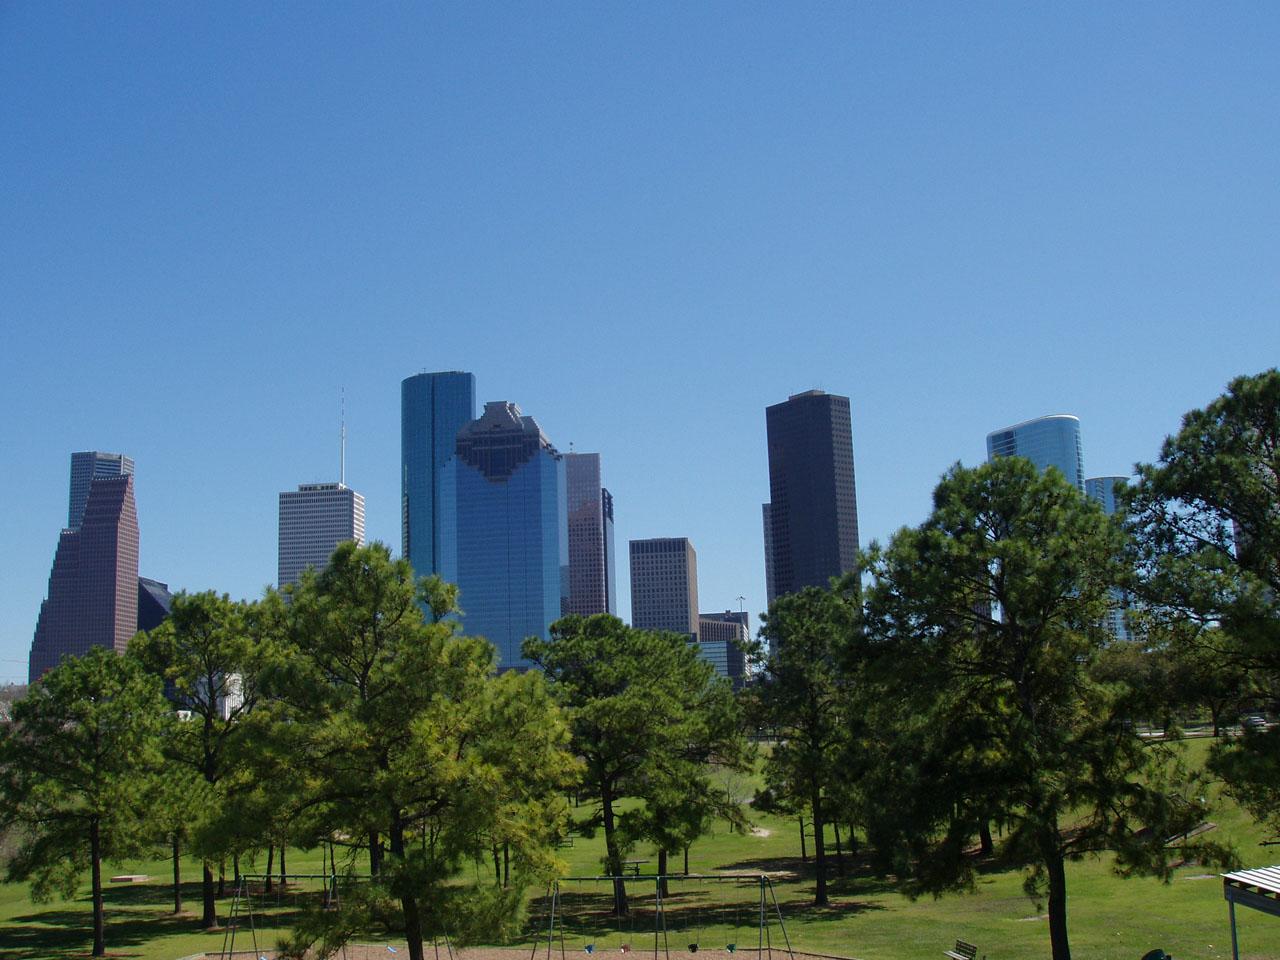 Fot Houston Texas USA flickrcom by little black spot on the 1280x960